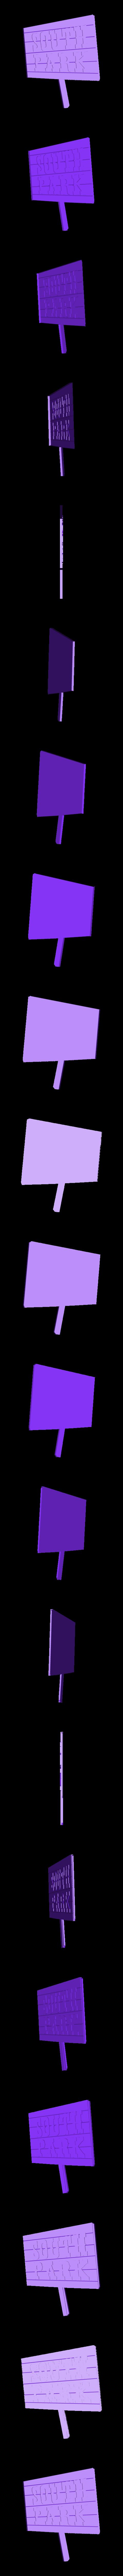 South_Park_Sign_no_hanger.stl Download free STL file Mr Hankey & South Park Sign • 3D printing design, ChaosCoreTech